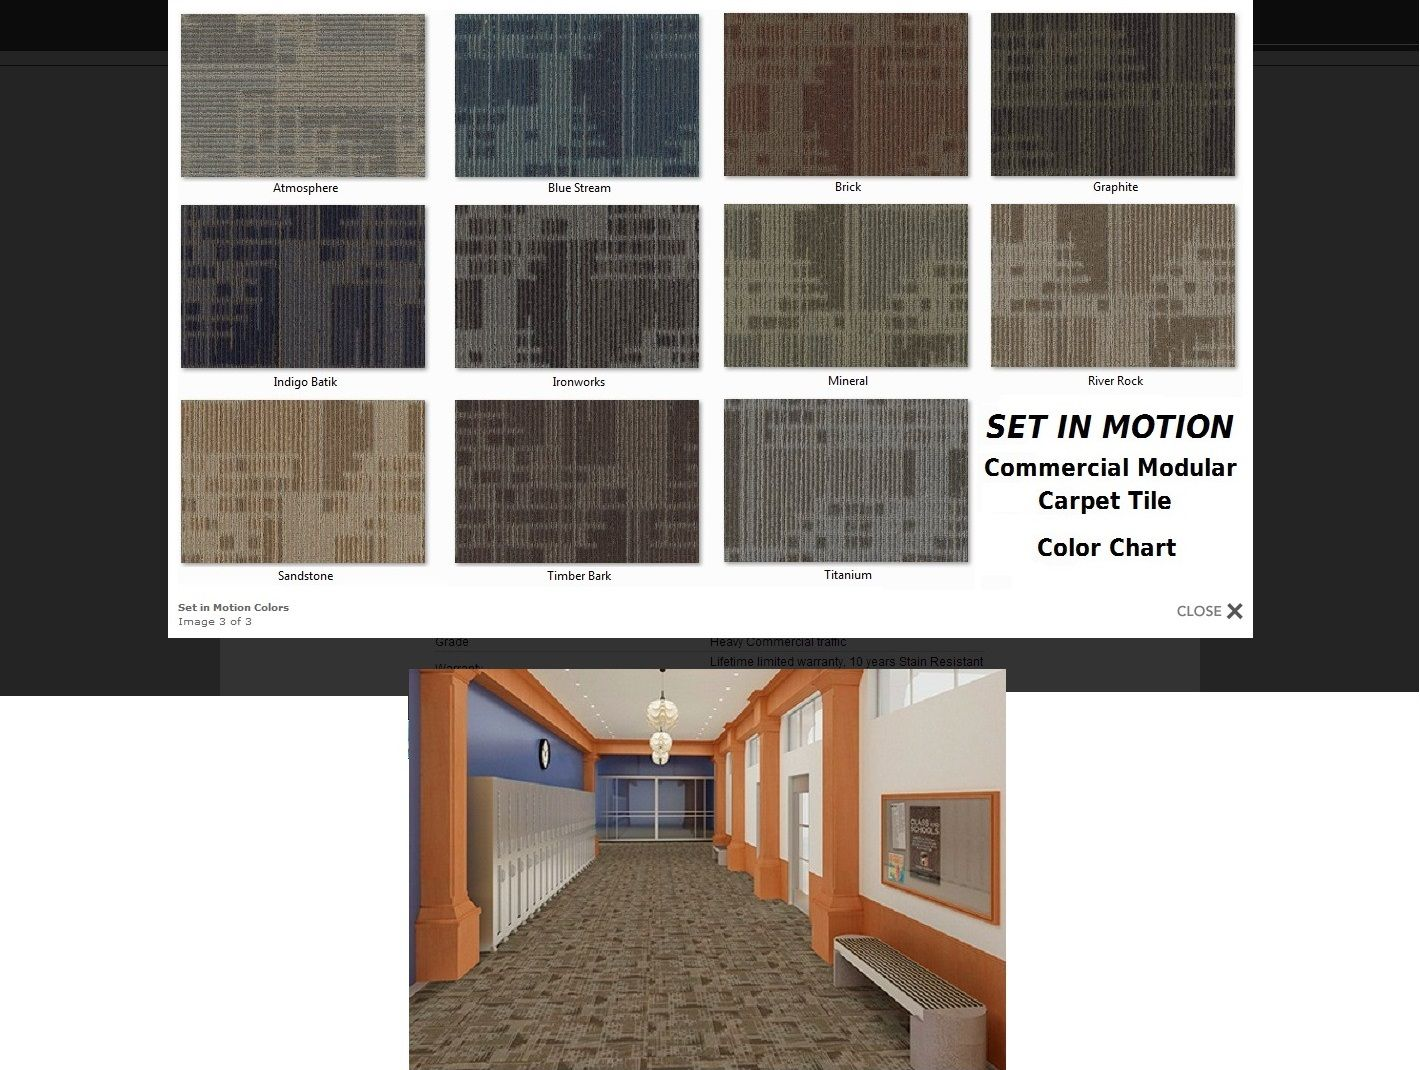 Set In Motion Tile Is A Commercial Modular Tile For Heavy Traffic